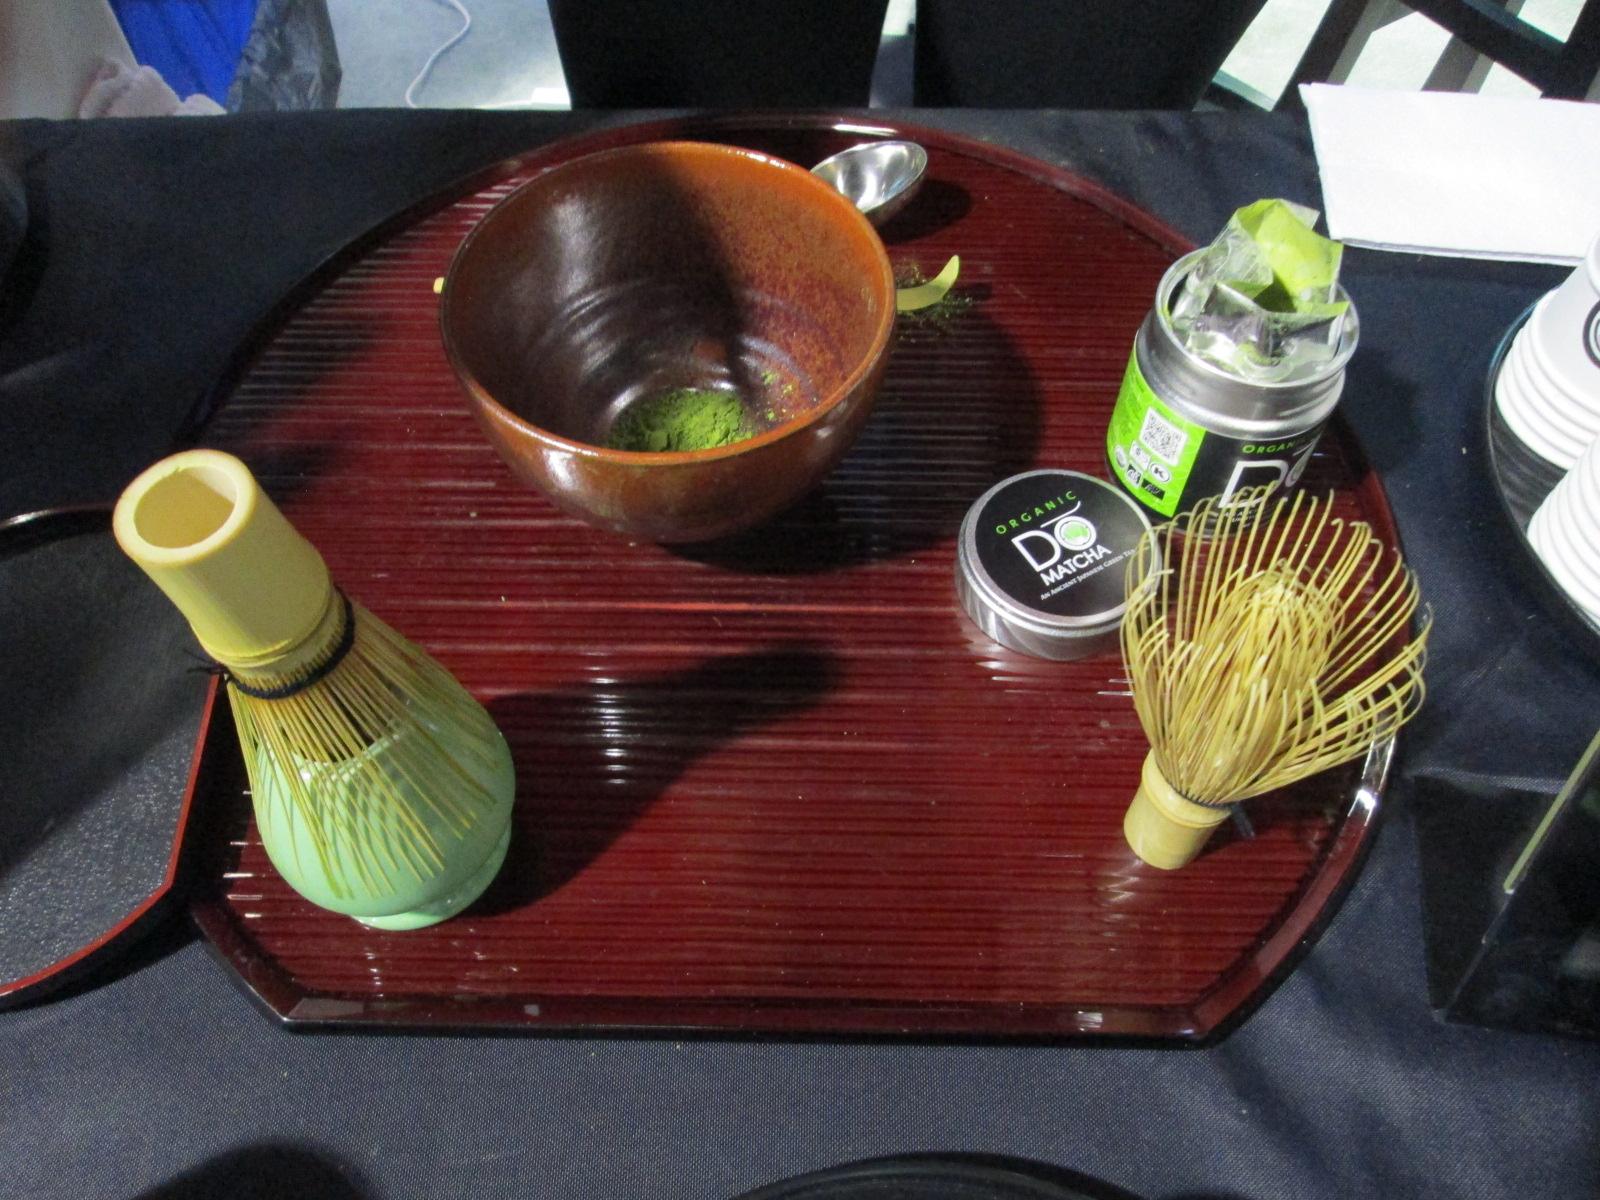 Domatcha preparation for tasting